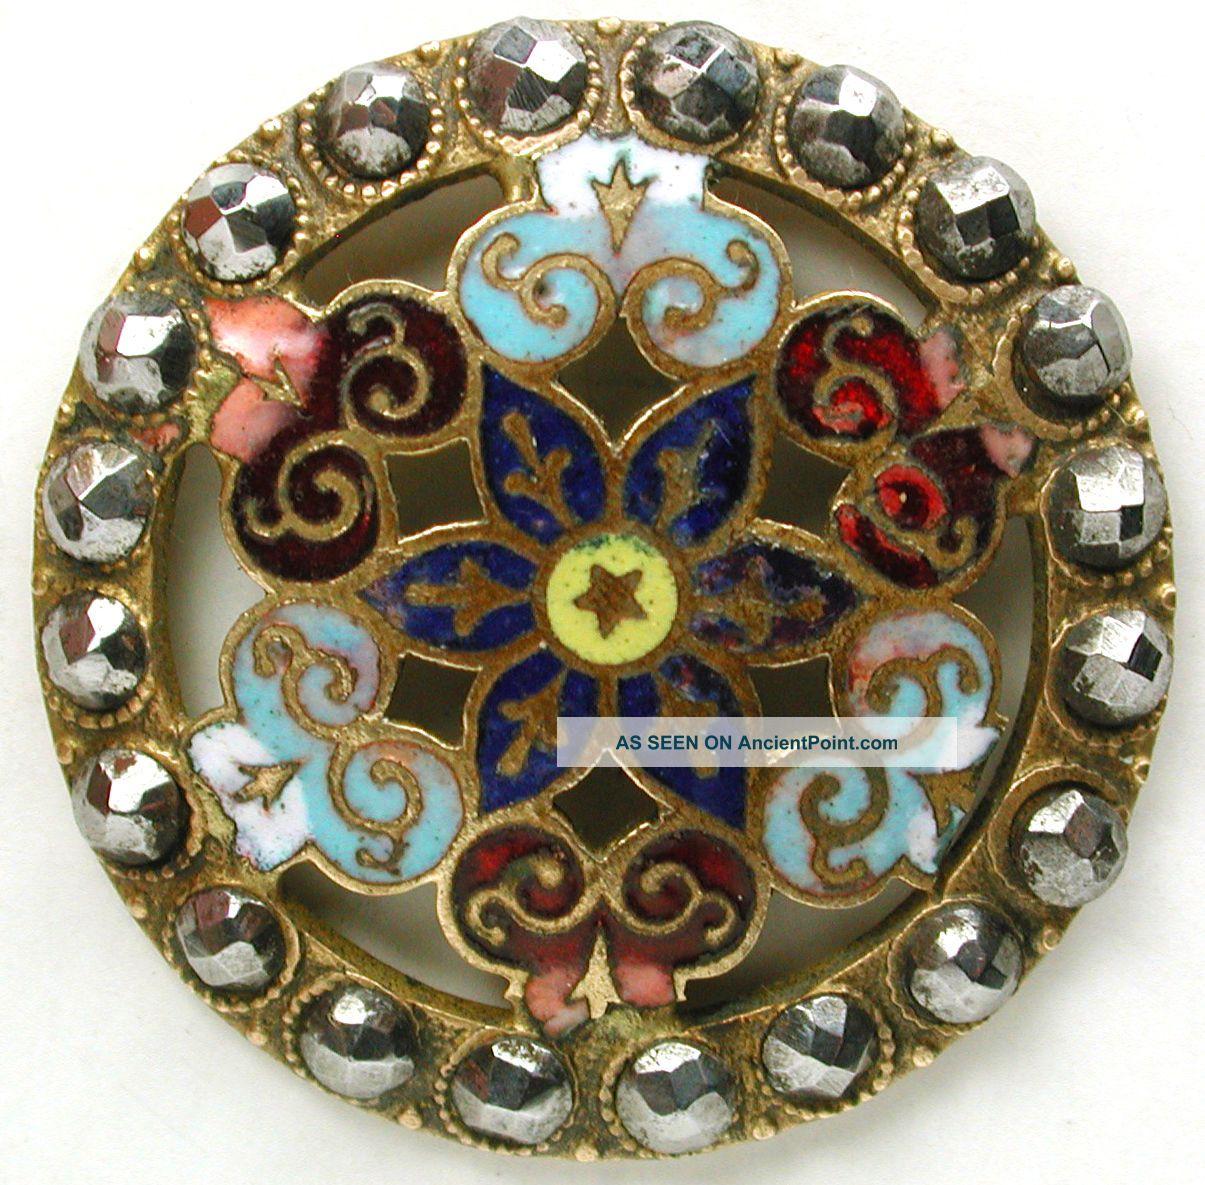 Antique Enamel Button Colorful Pierced Design W/ Cut Steel Border 1 & 1/8